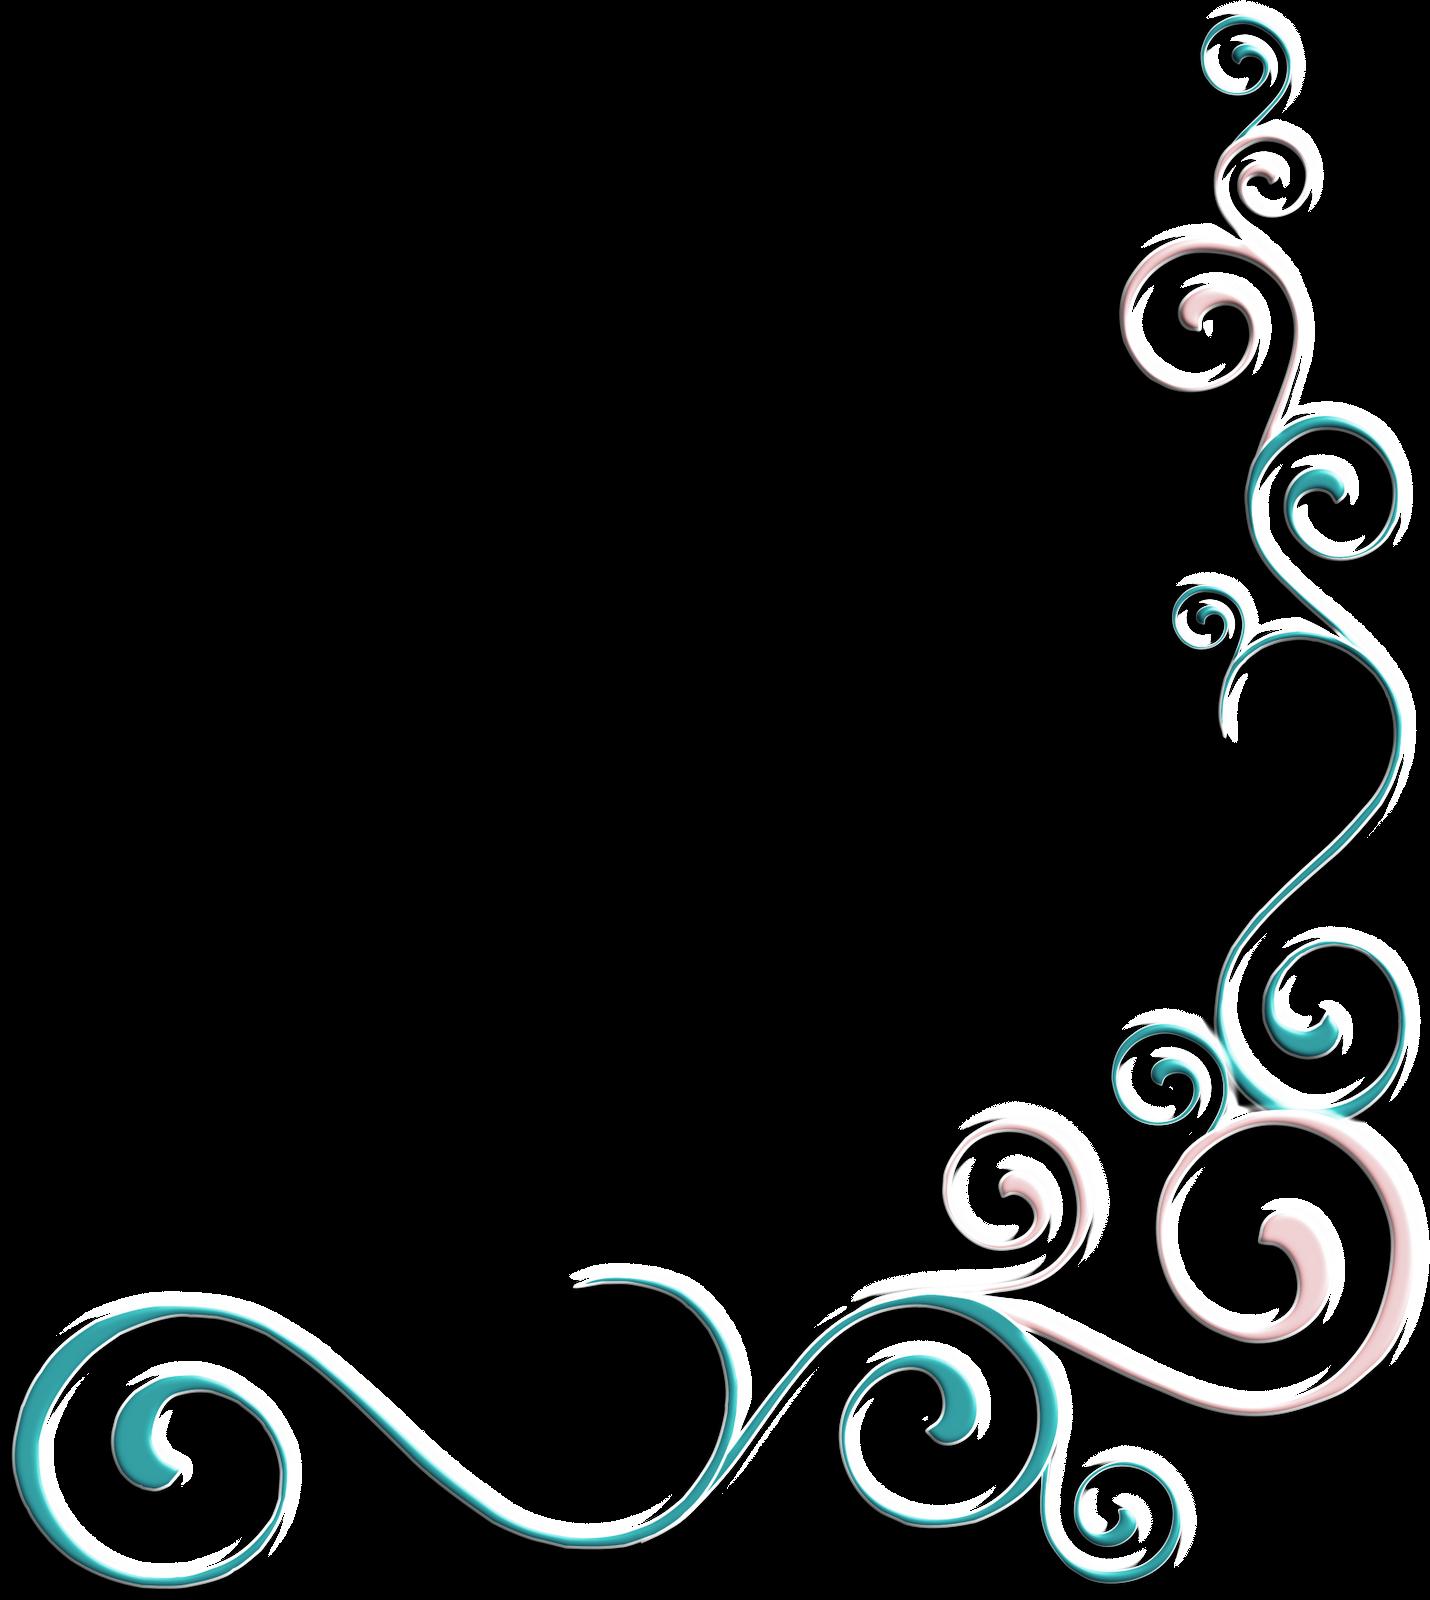 Patterns border designs scroll. Flourish clipart whimsical